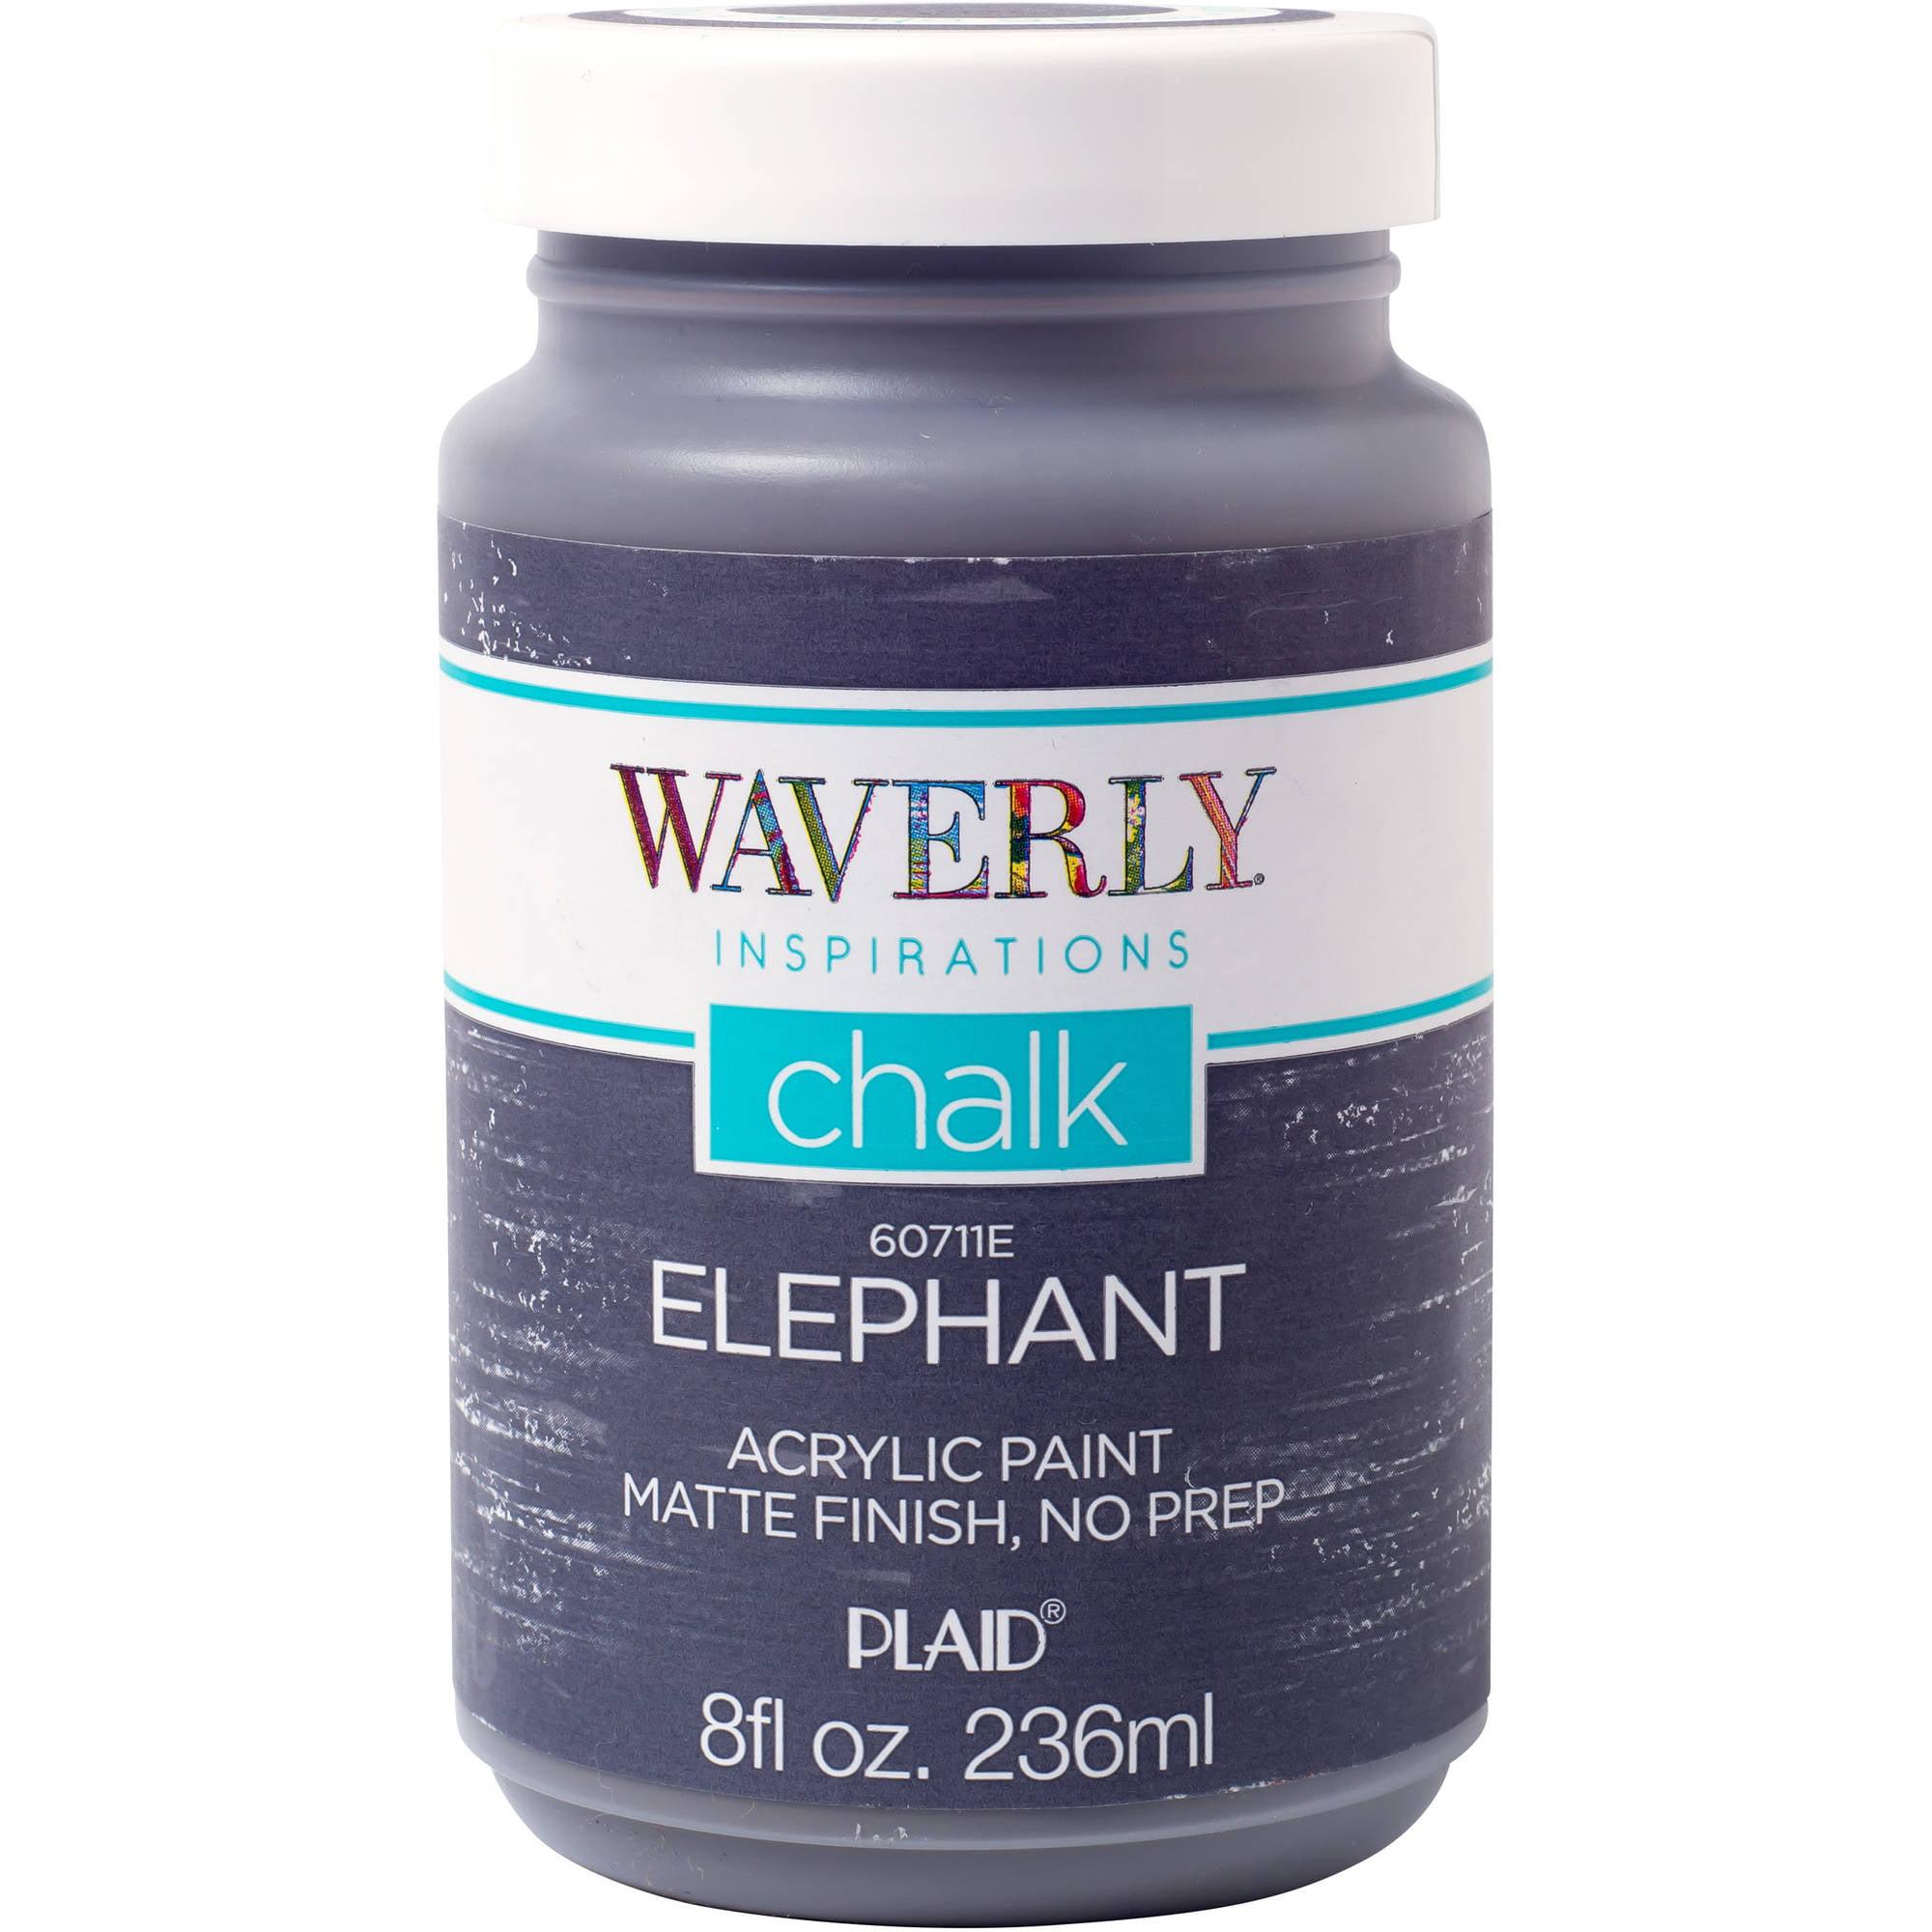 Waverly Inspirations Matte Chalk Finish Acrylic Paint by Plaid, Elephant, 8 oz.